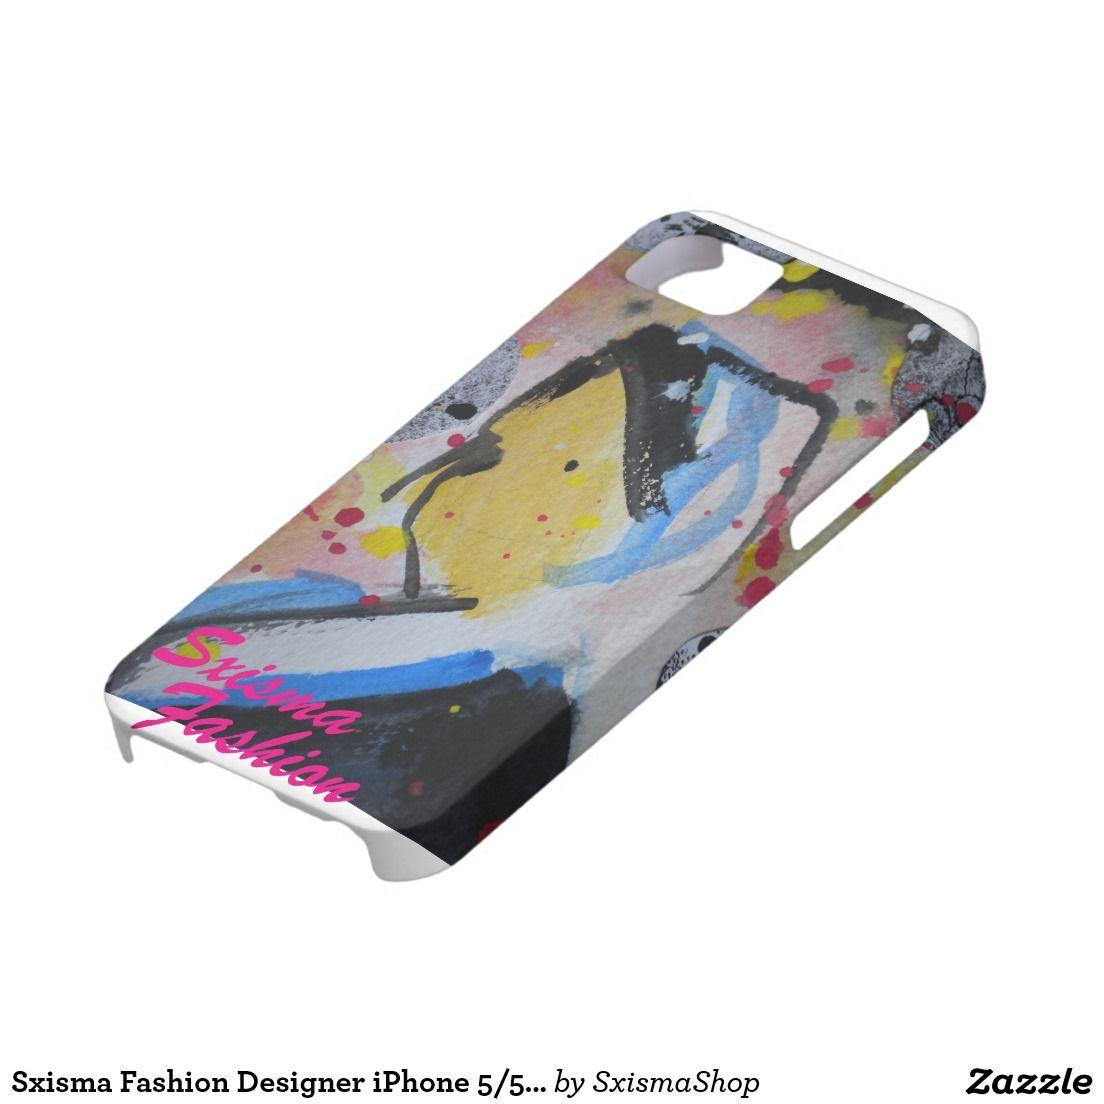 Sxisma Fashion Designer Iphone 5 5s Barely There Iphone 5 Covers Iphone Iphone 5 Iphone Cases